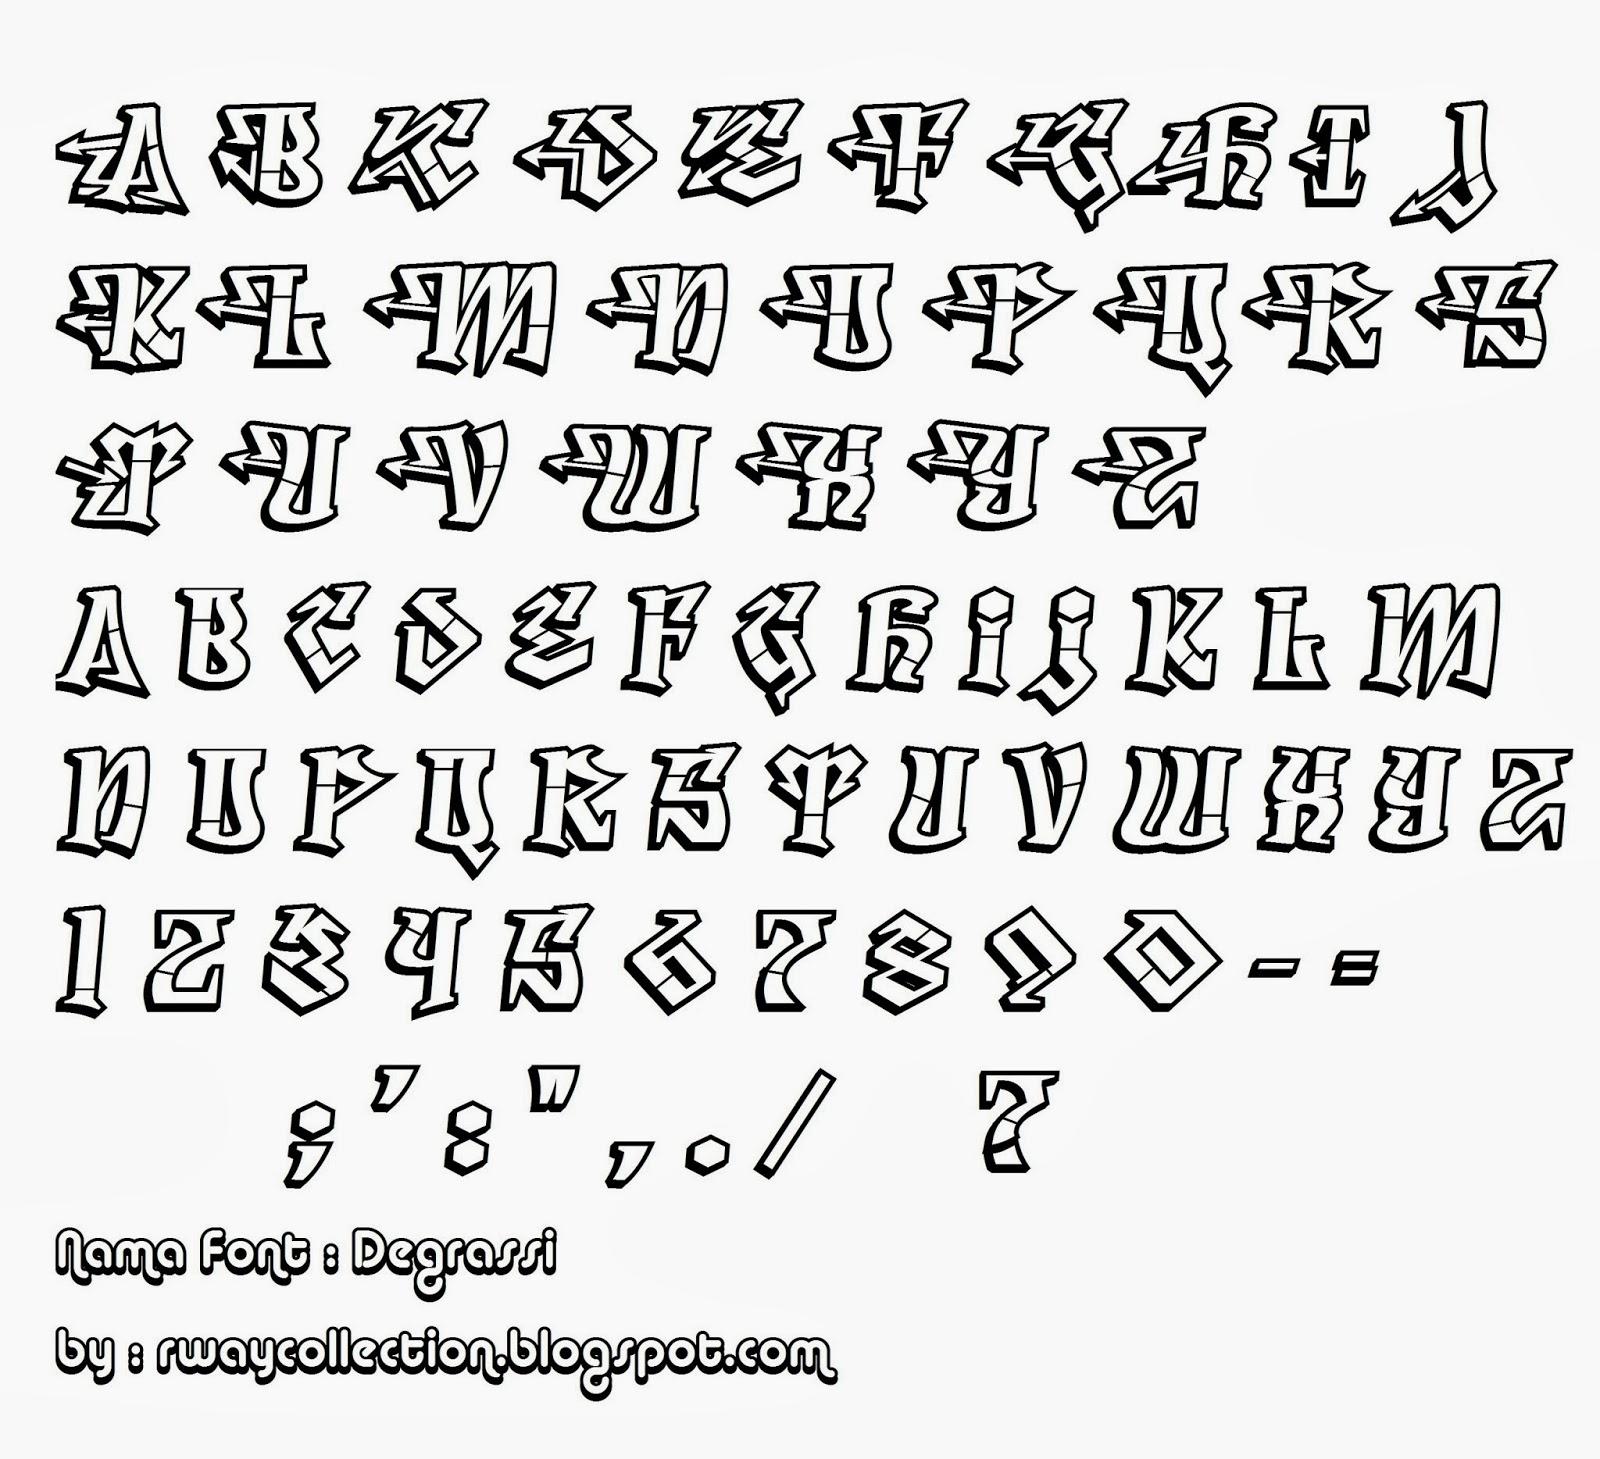 Huruf keren huruf keren huruf keren huruf keren huruf keren huruf